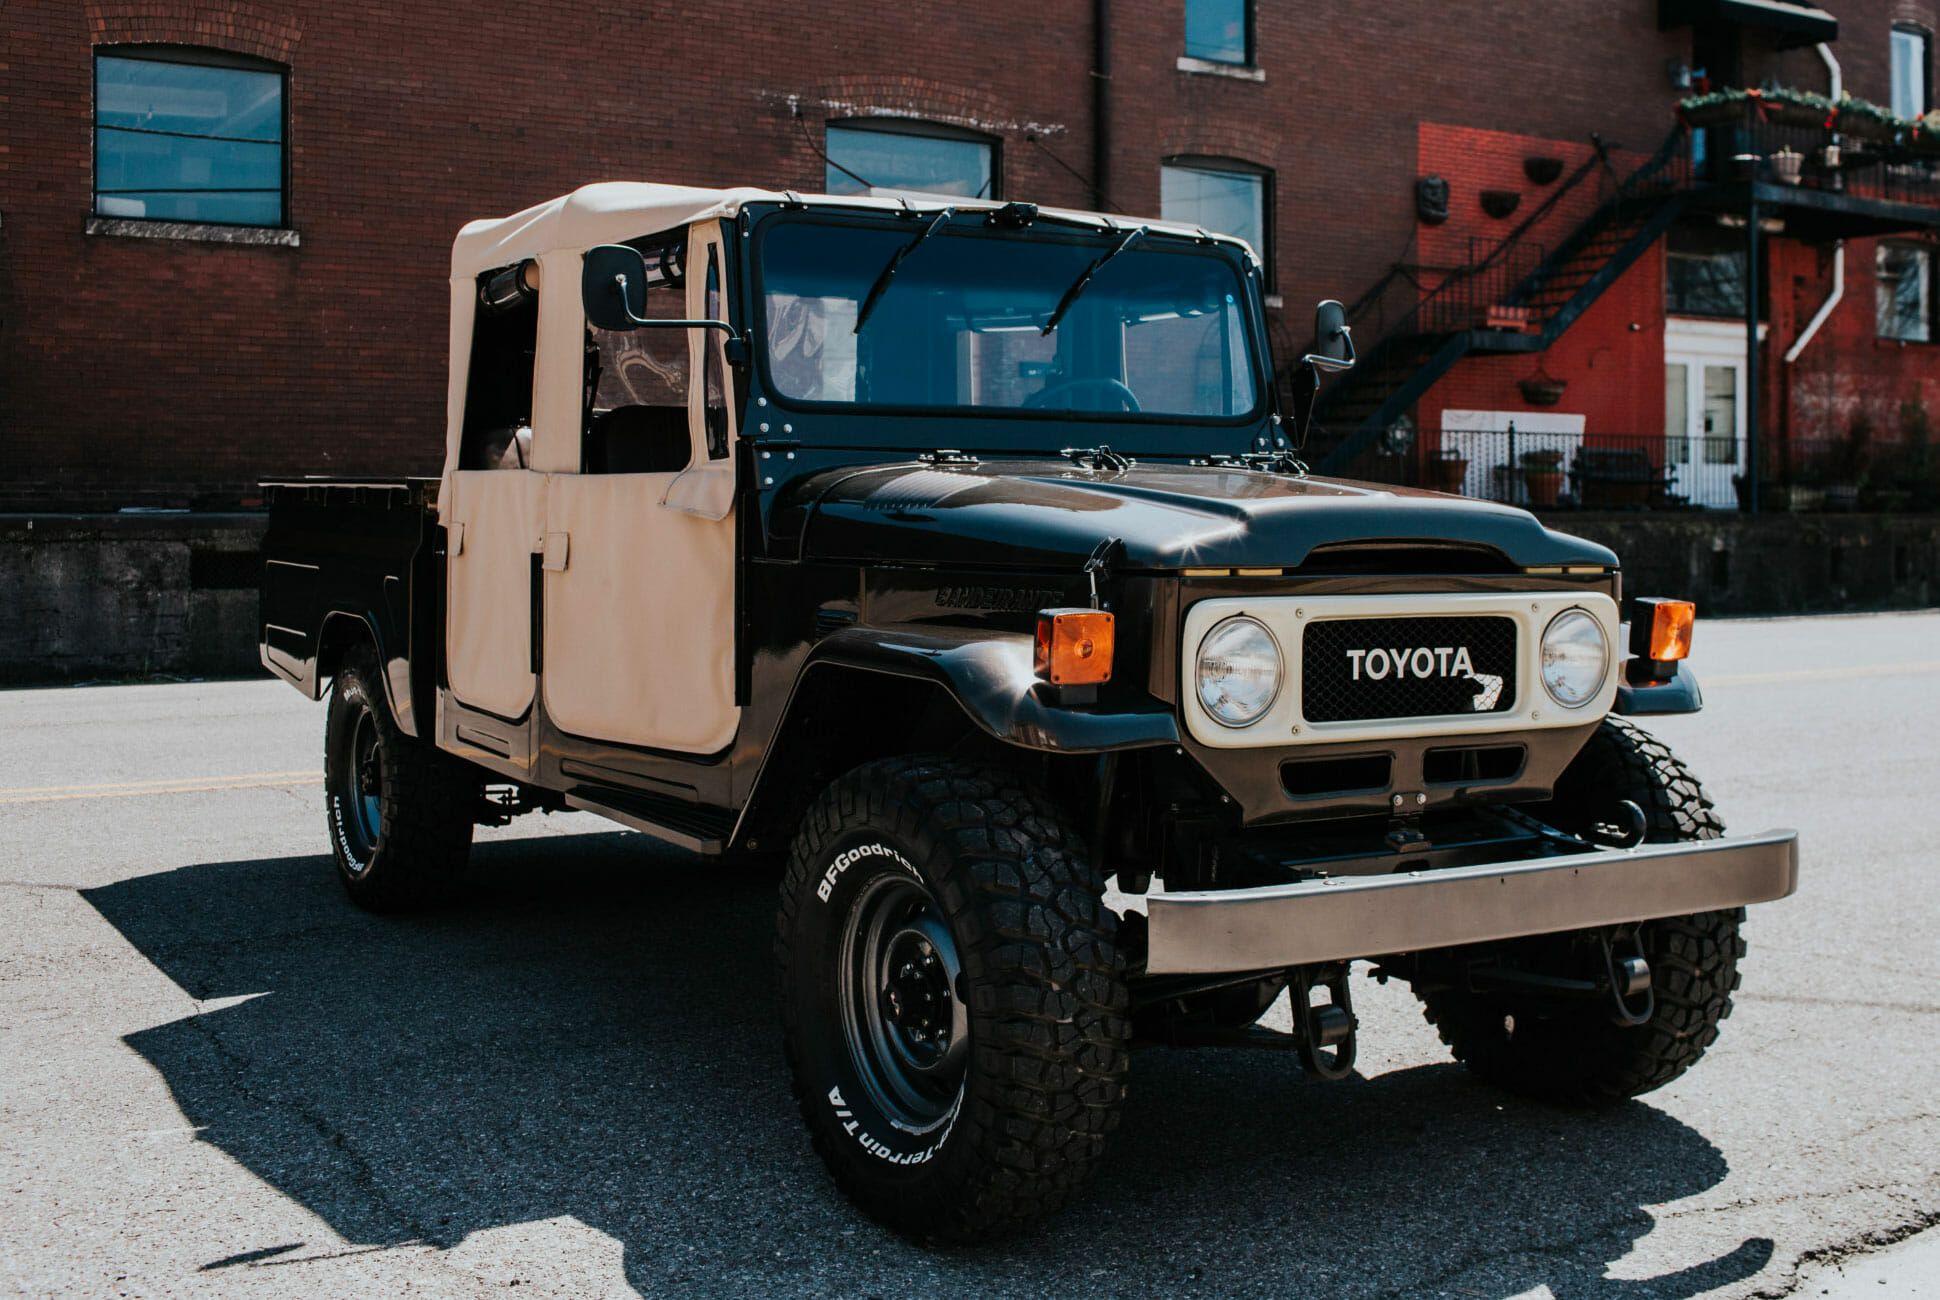 Toyota-Bandeirante-OJ55-gear-patrol-slide-01